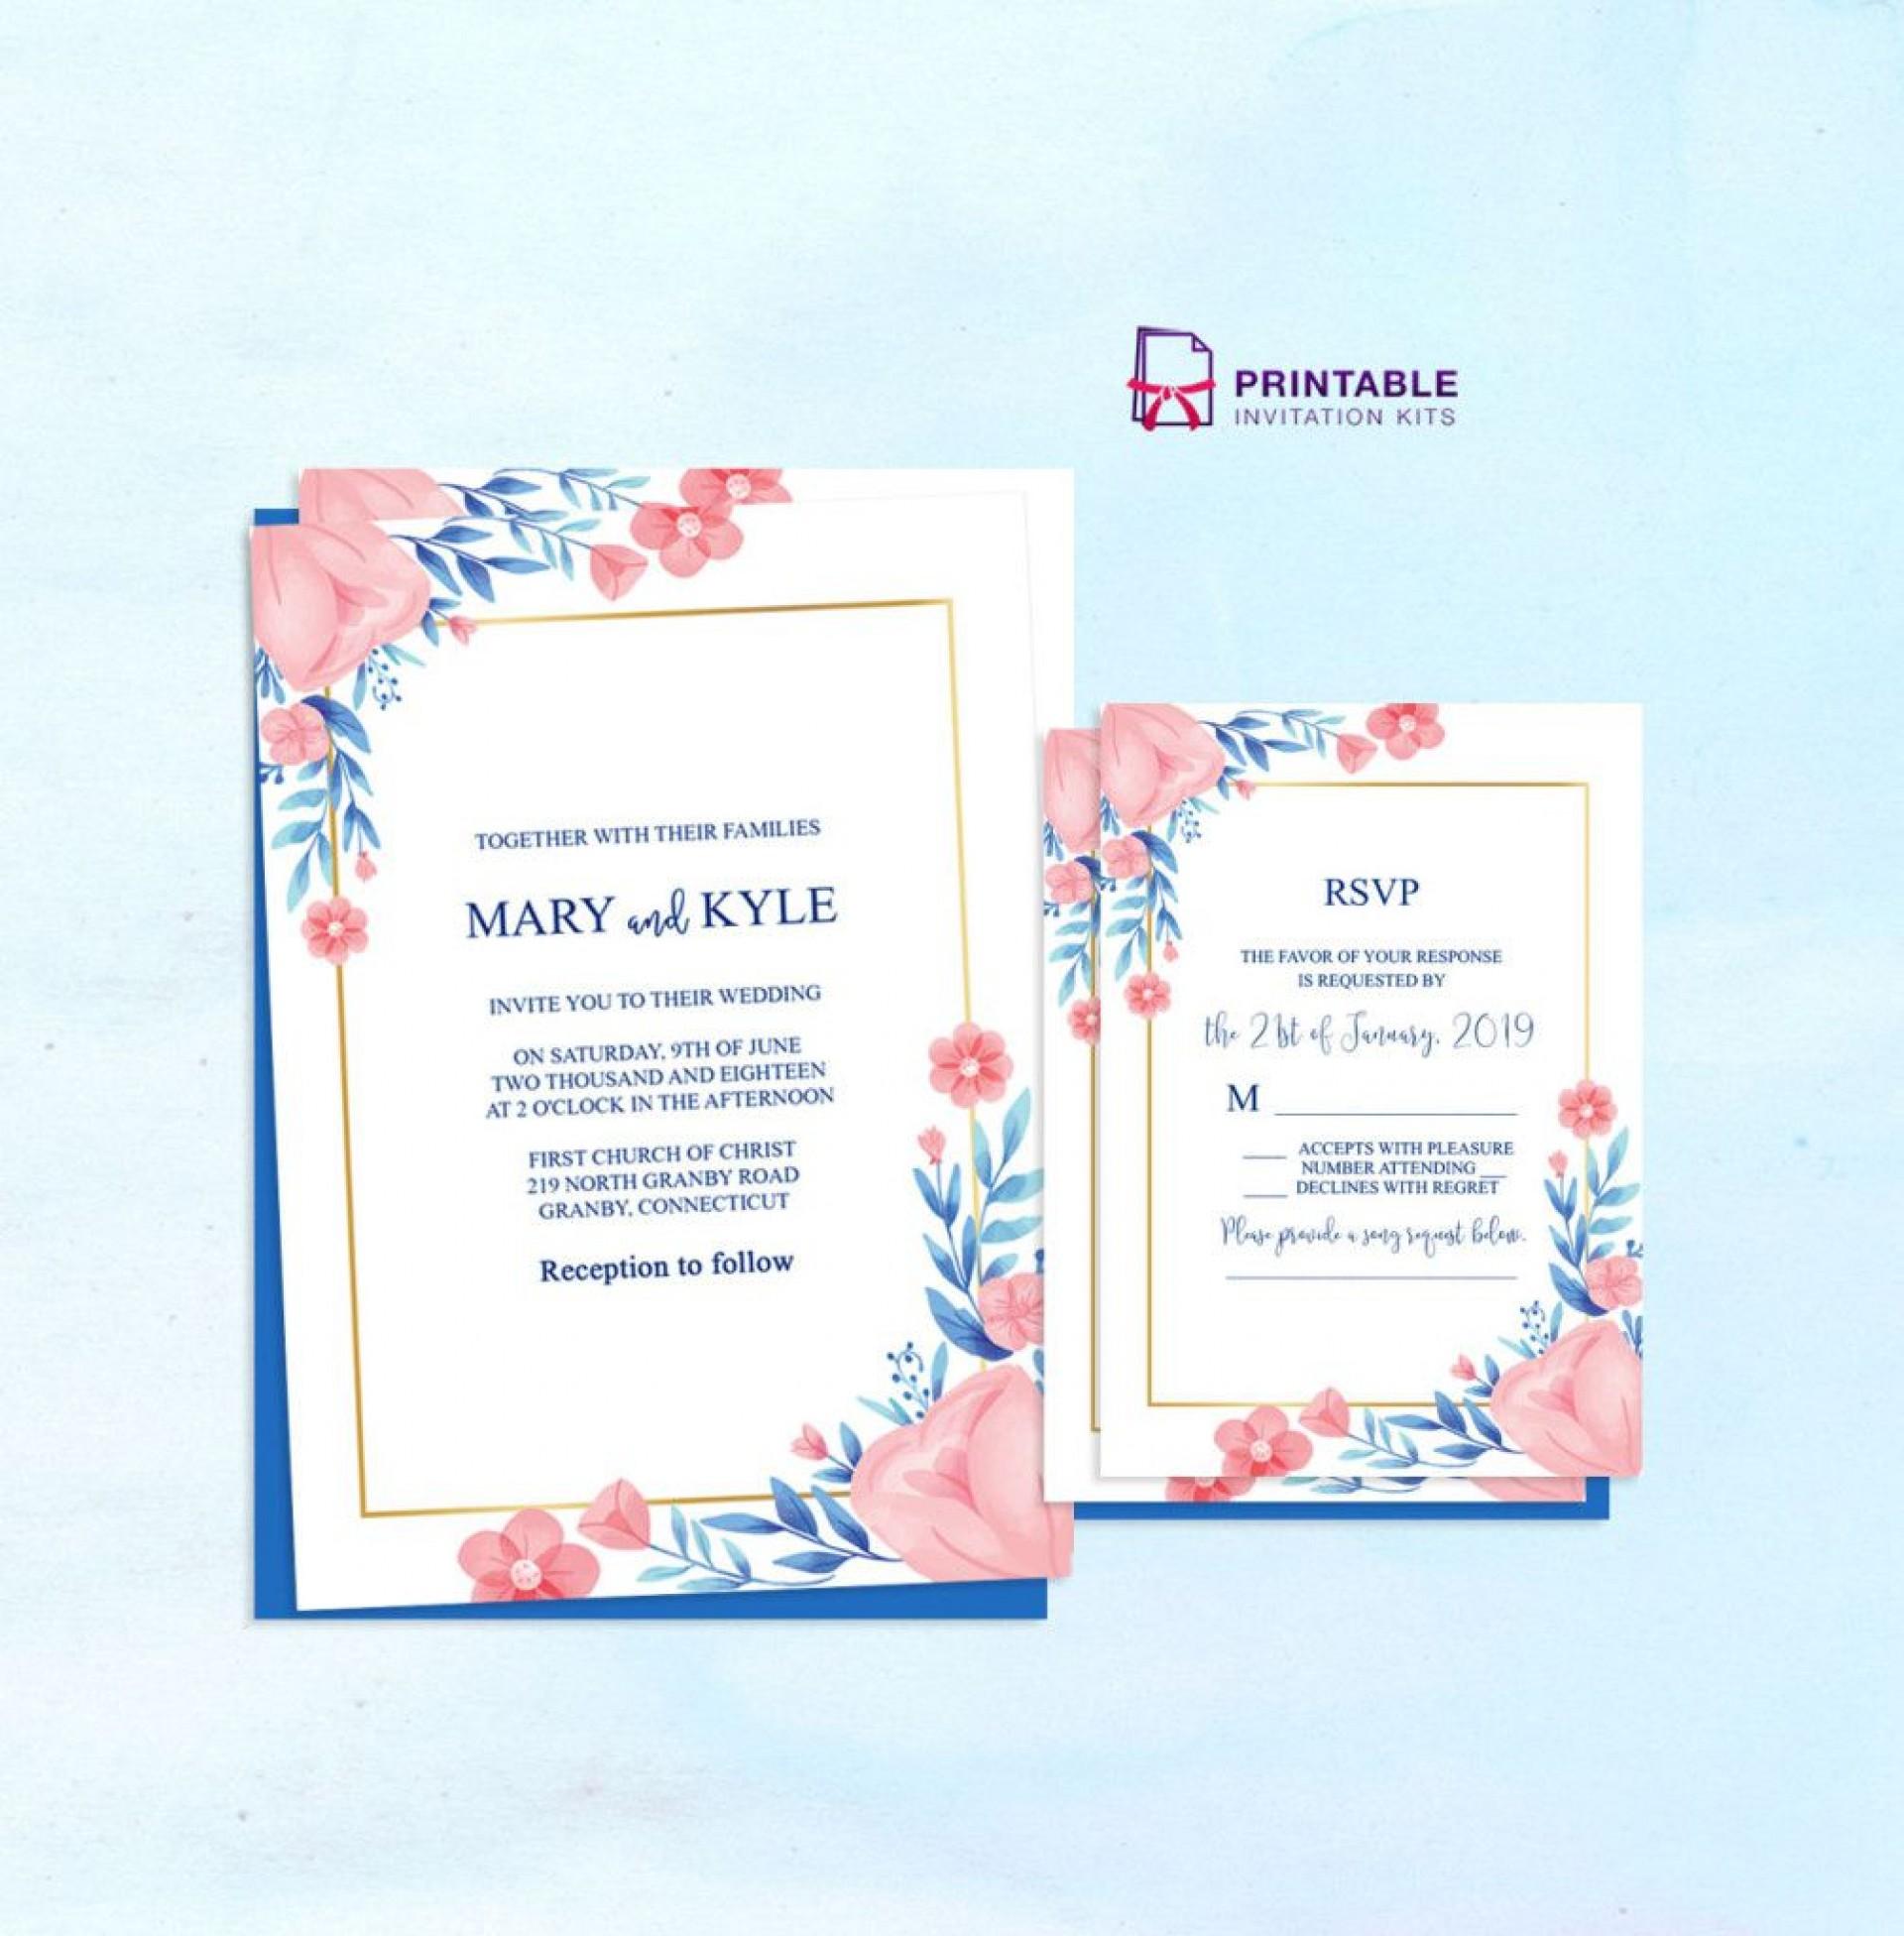 000 Archaicawful Sample Wedding Invitation Template Idea  Templates Wording Card1920